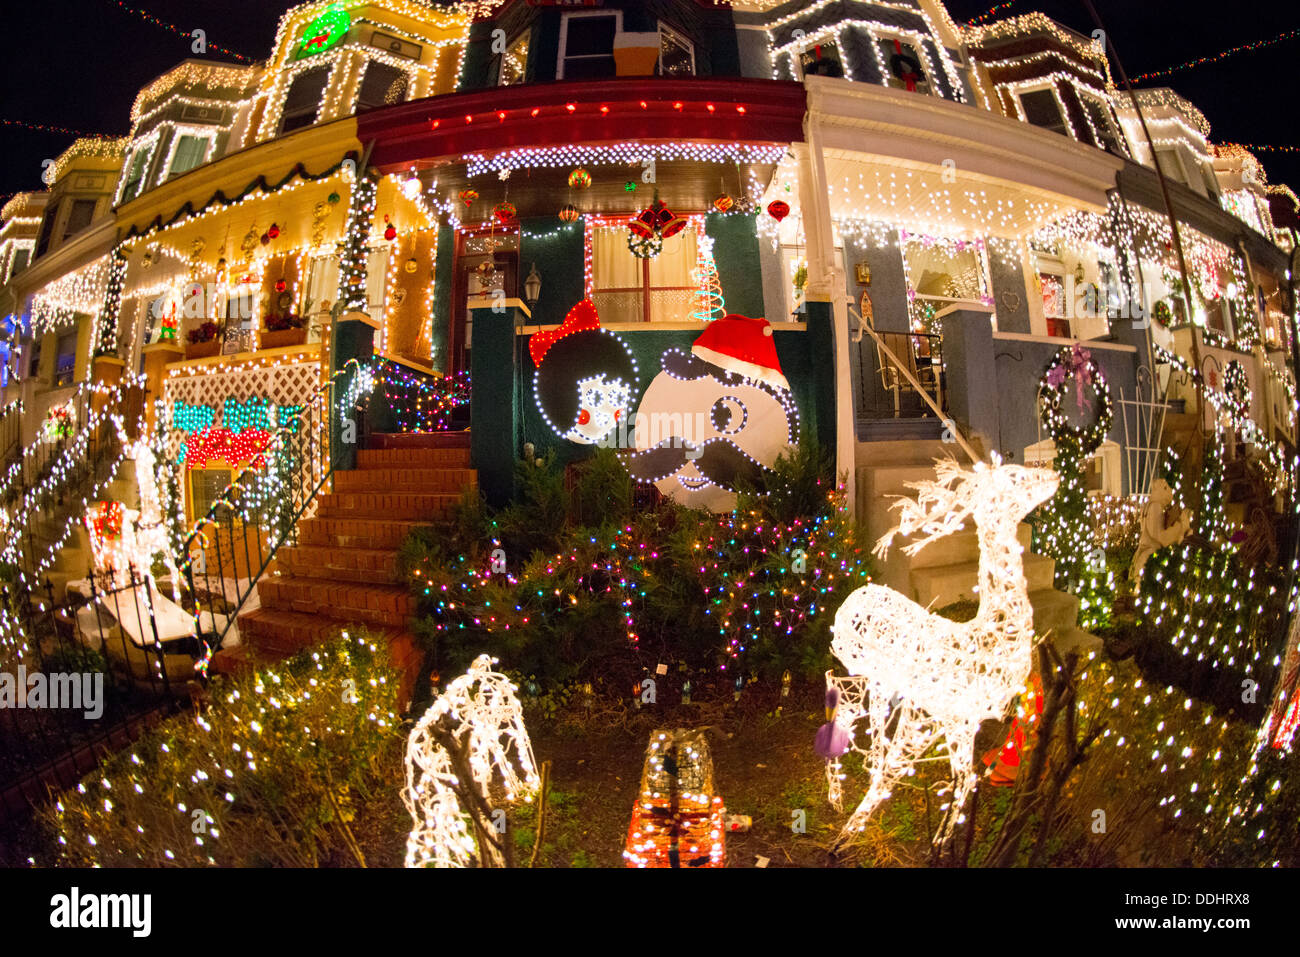 34th street lights in hampden baltimore stock image - Baltimore 34th Street Christmas Lights